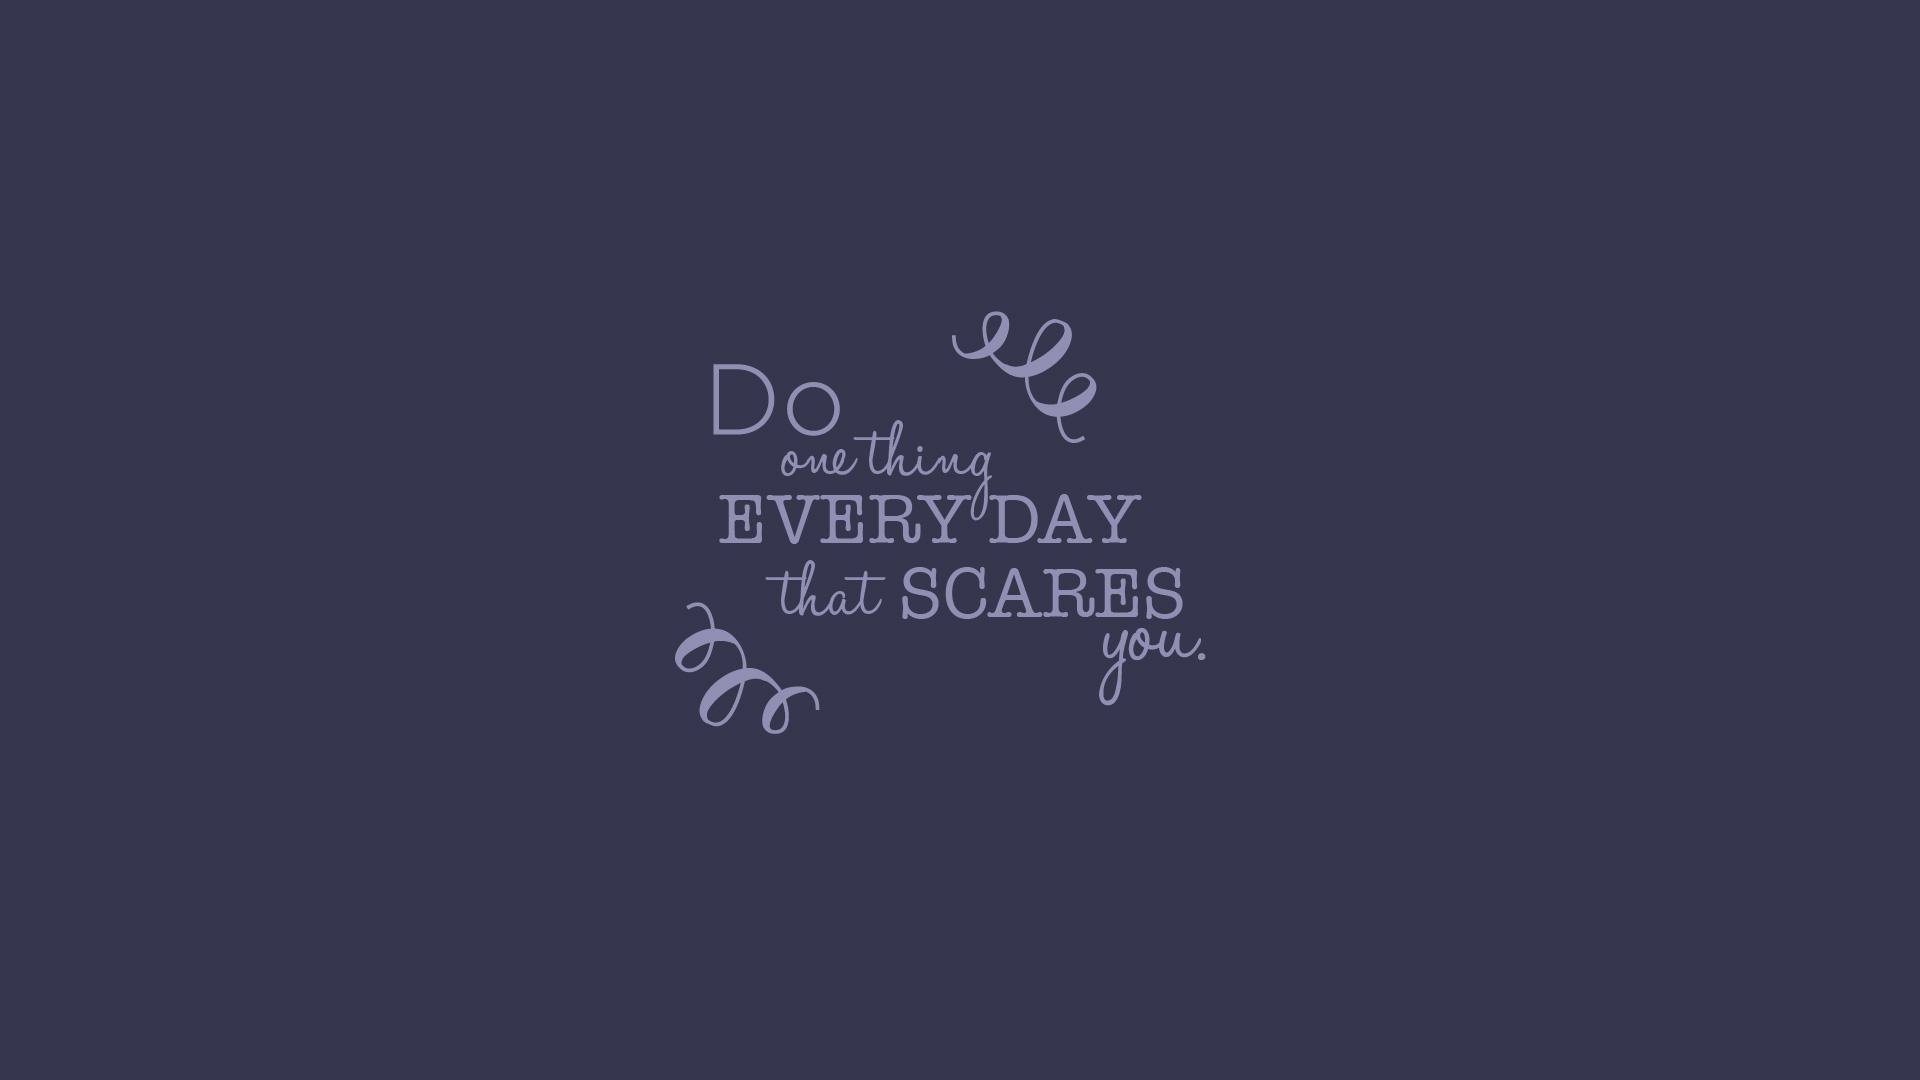 Disney Fall Desktop Wallpaper 115 Best Motivational Wallpaper Examples With Inspiring Quotes